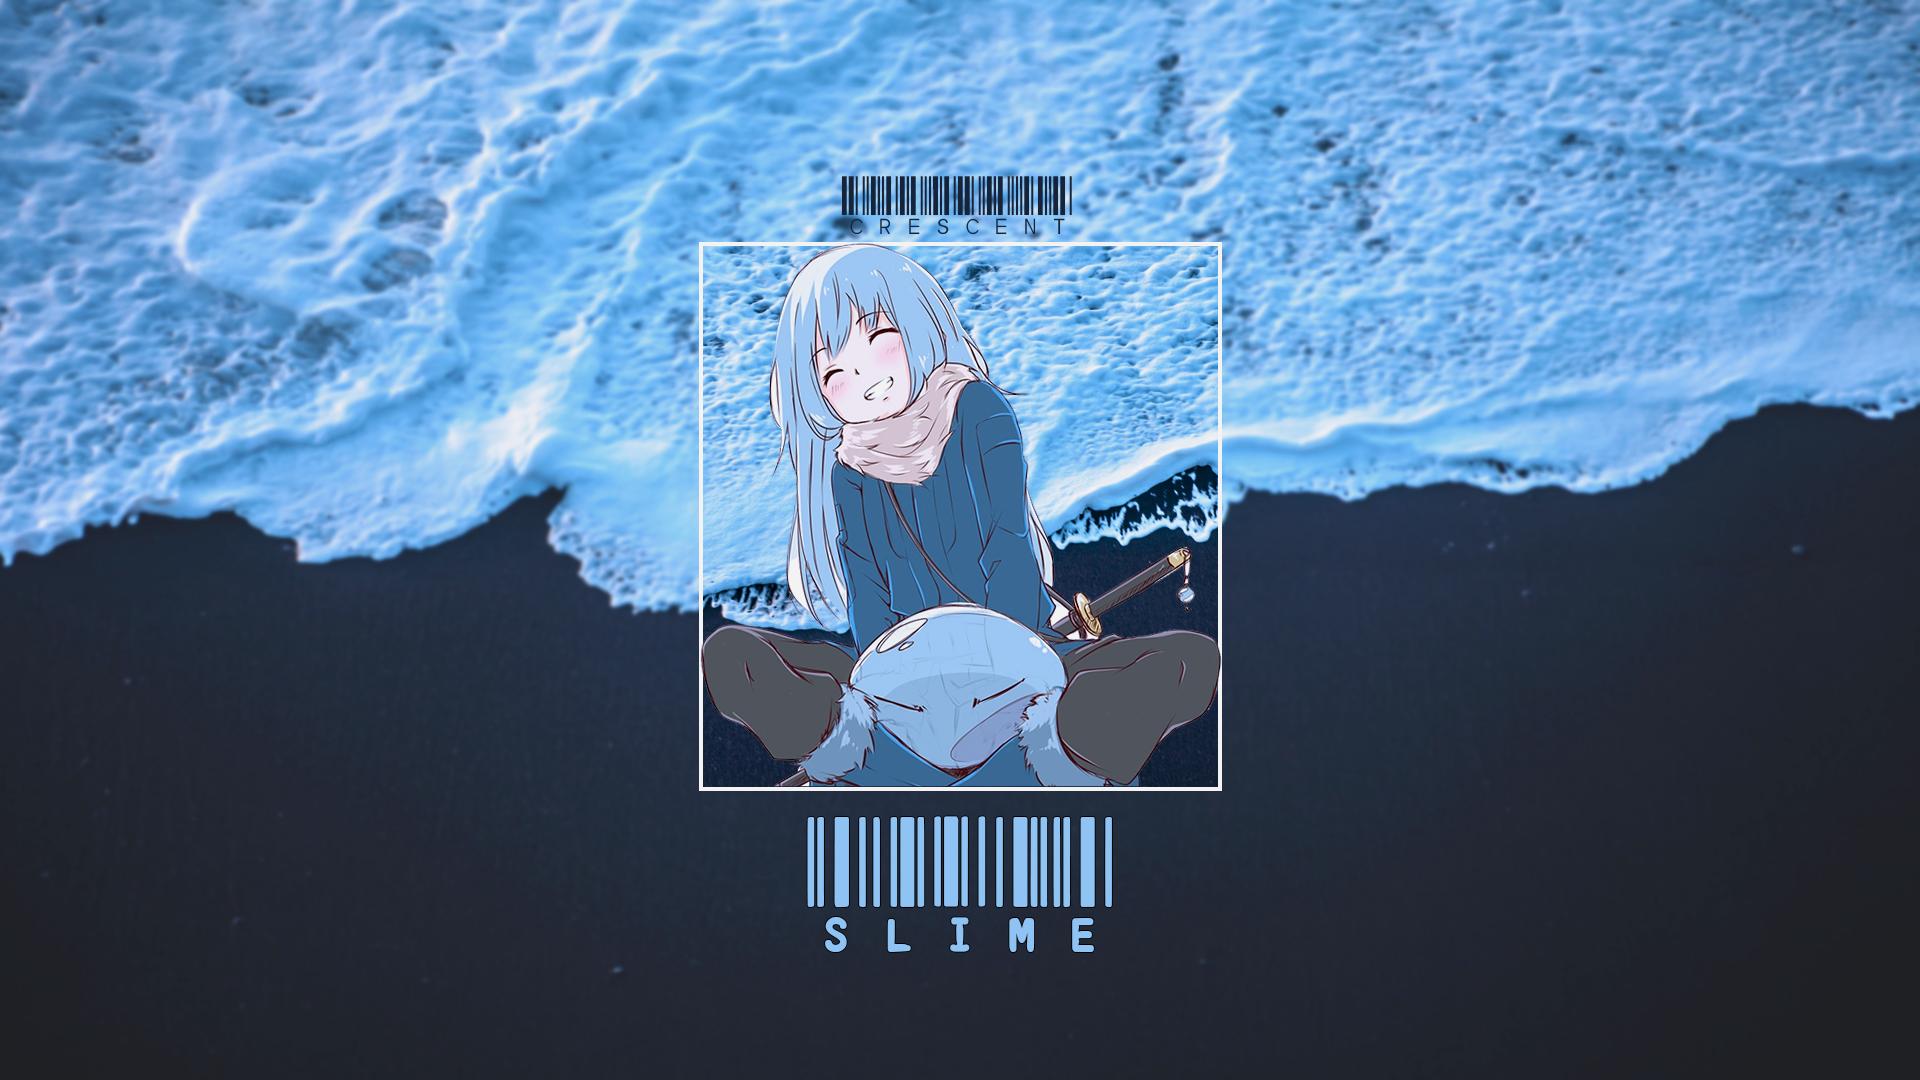 Anime 1920x1080 Tensei Shitara Slime Datta Ken Rimuru anime picture-in-picture cyan